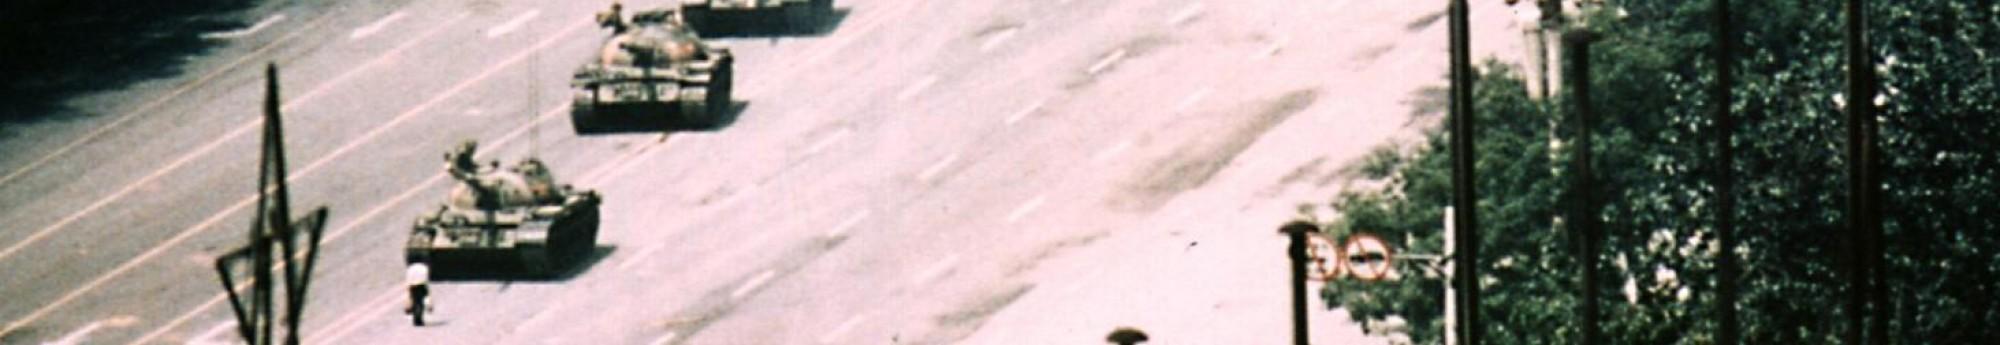 huntingataraxia